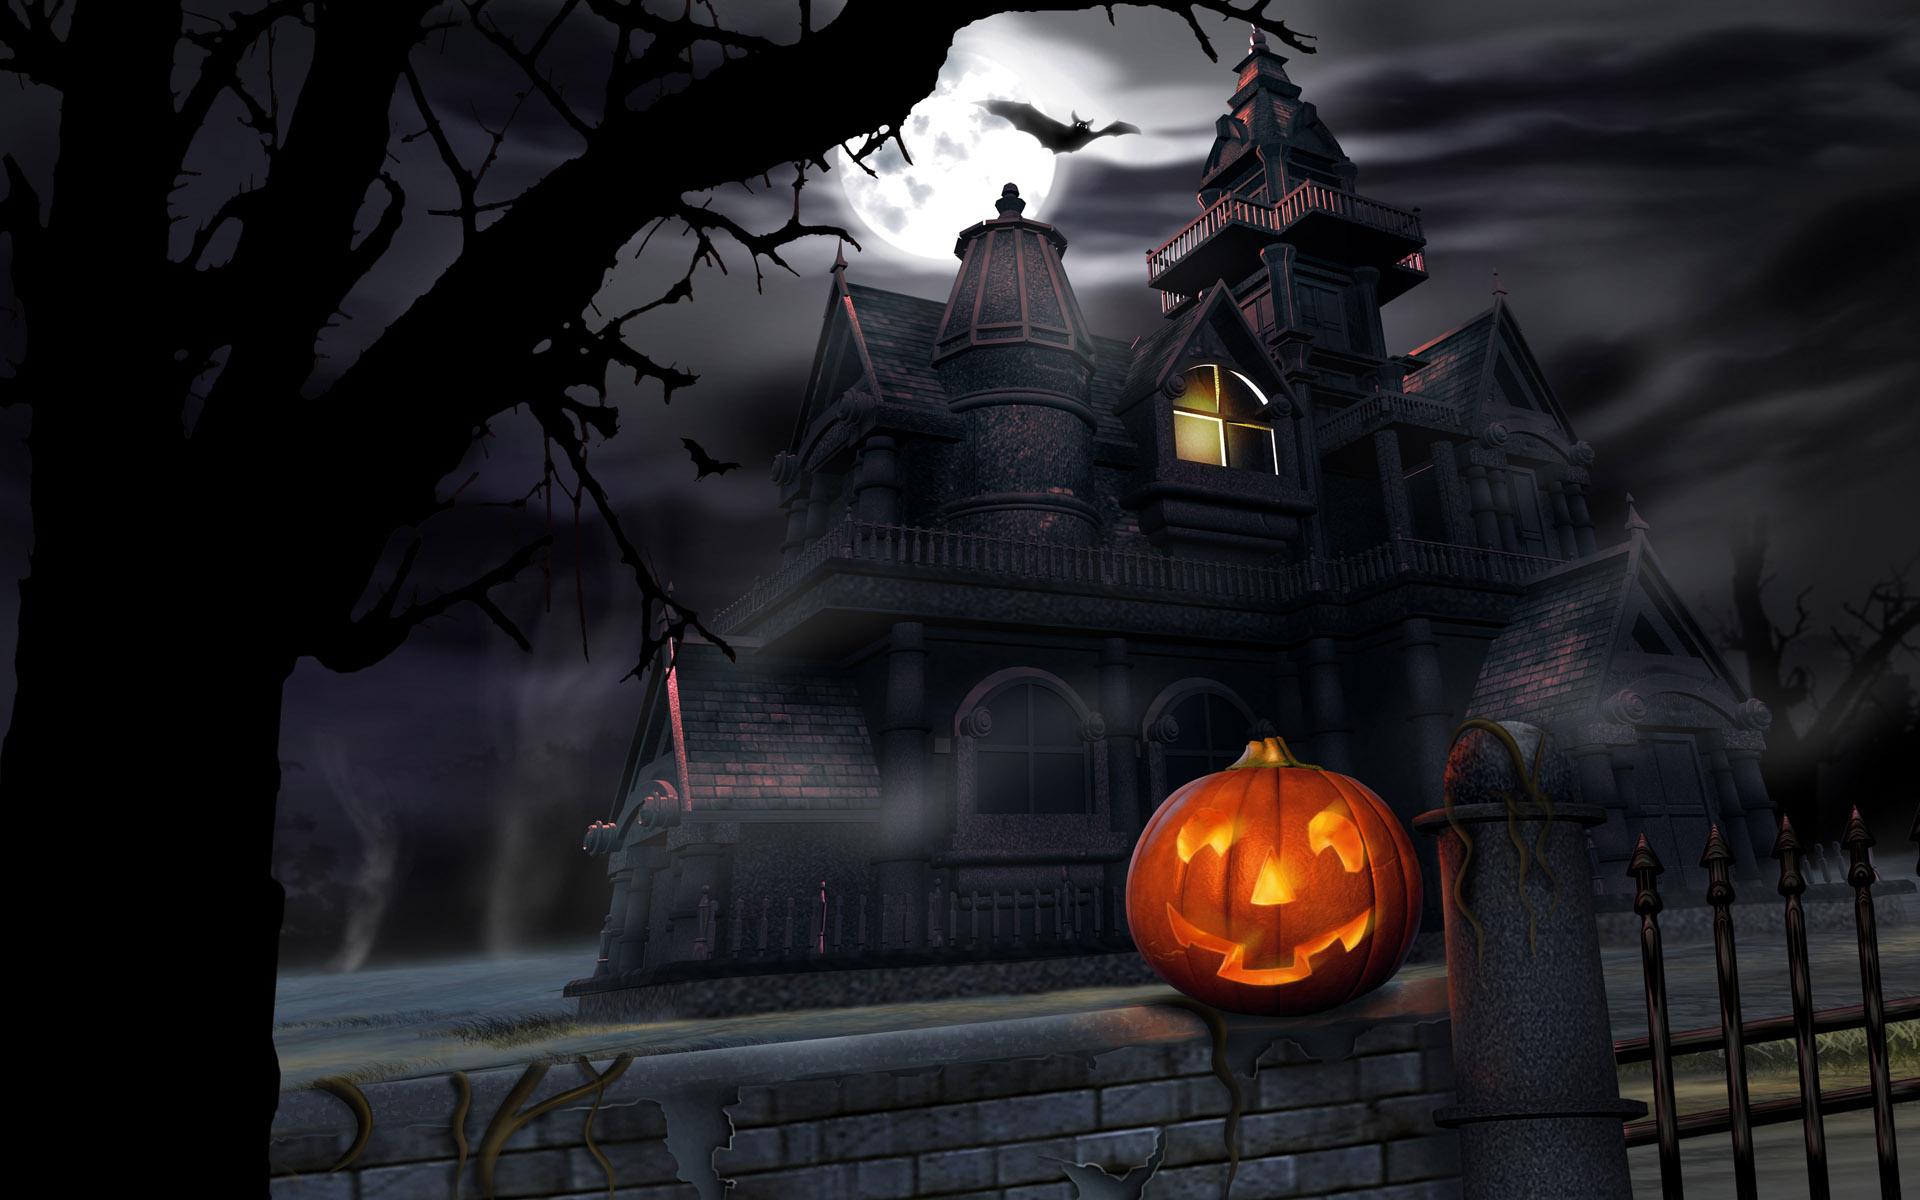 House-and-pumpkin-halloween-wallpapers